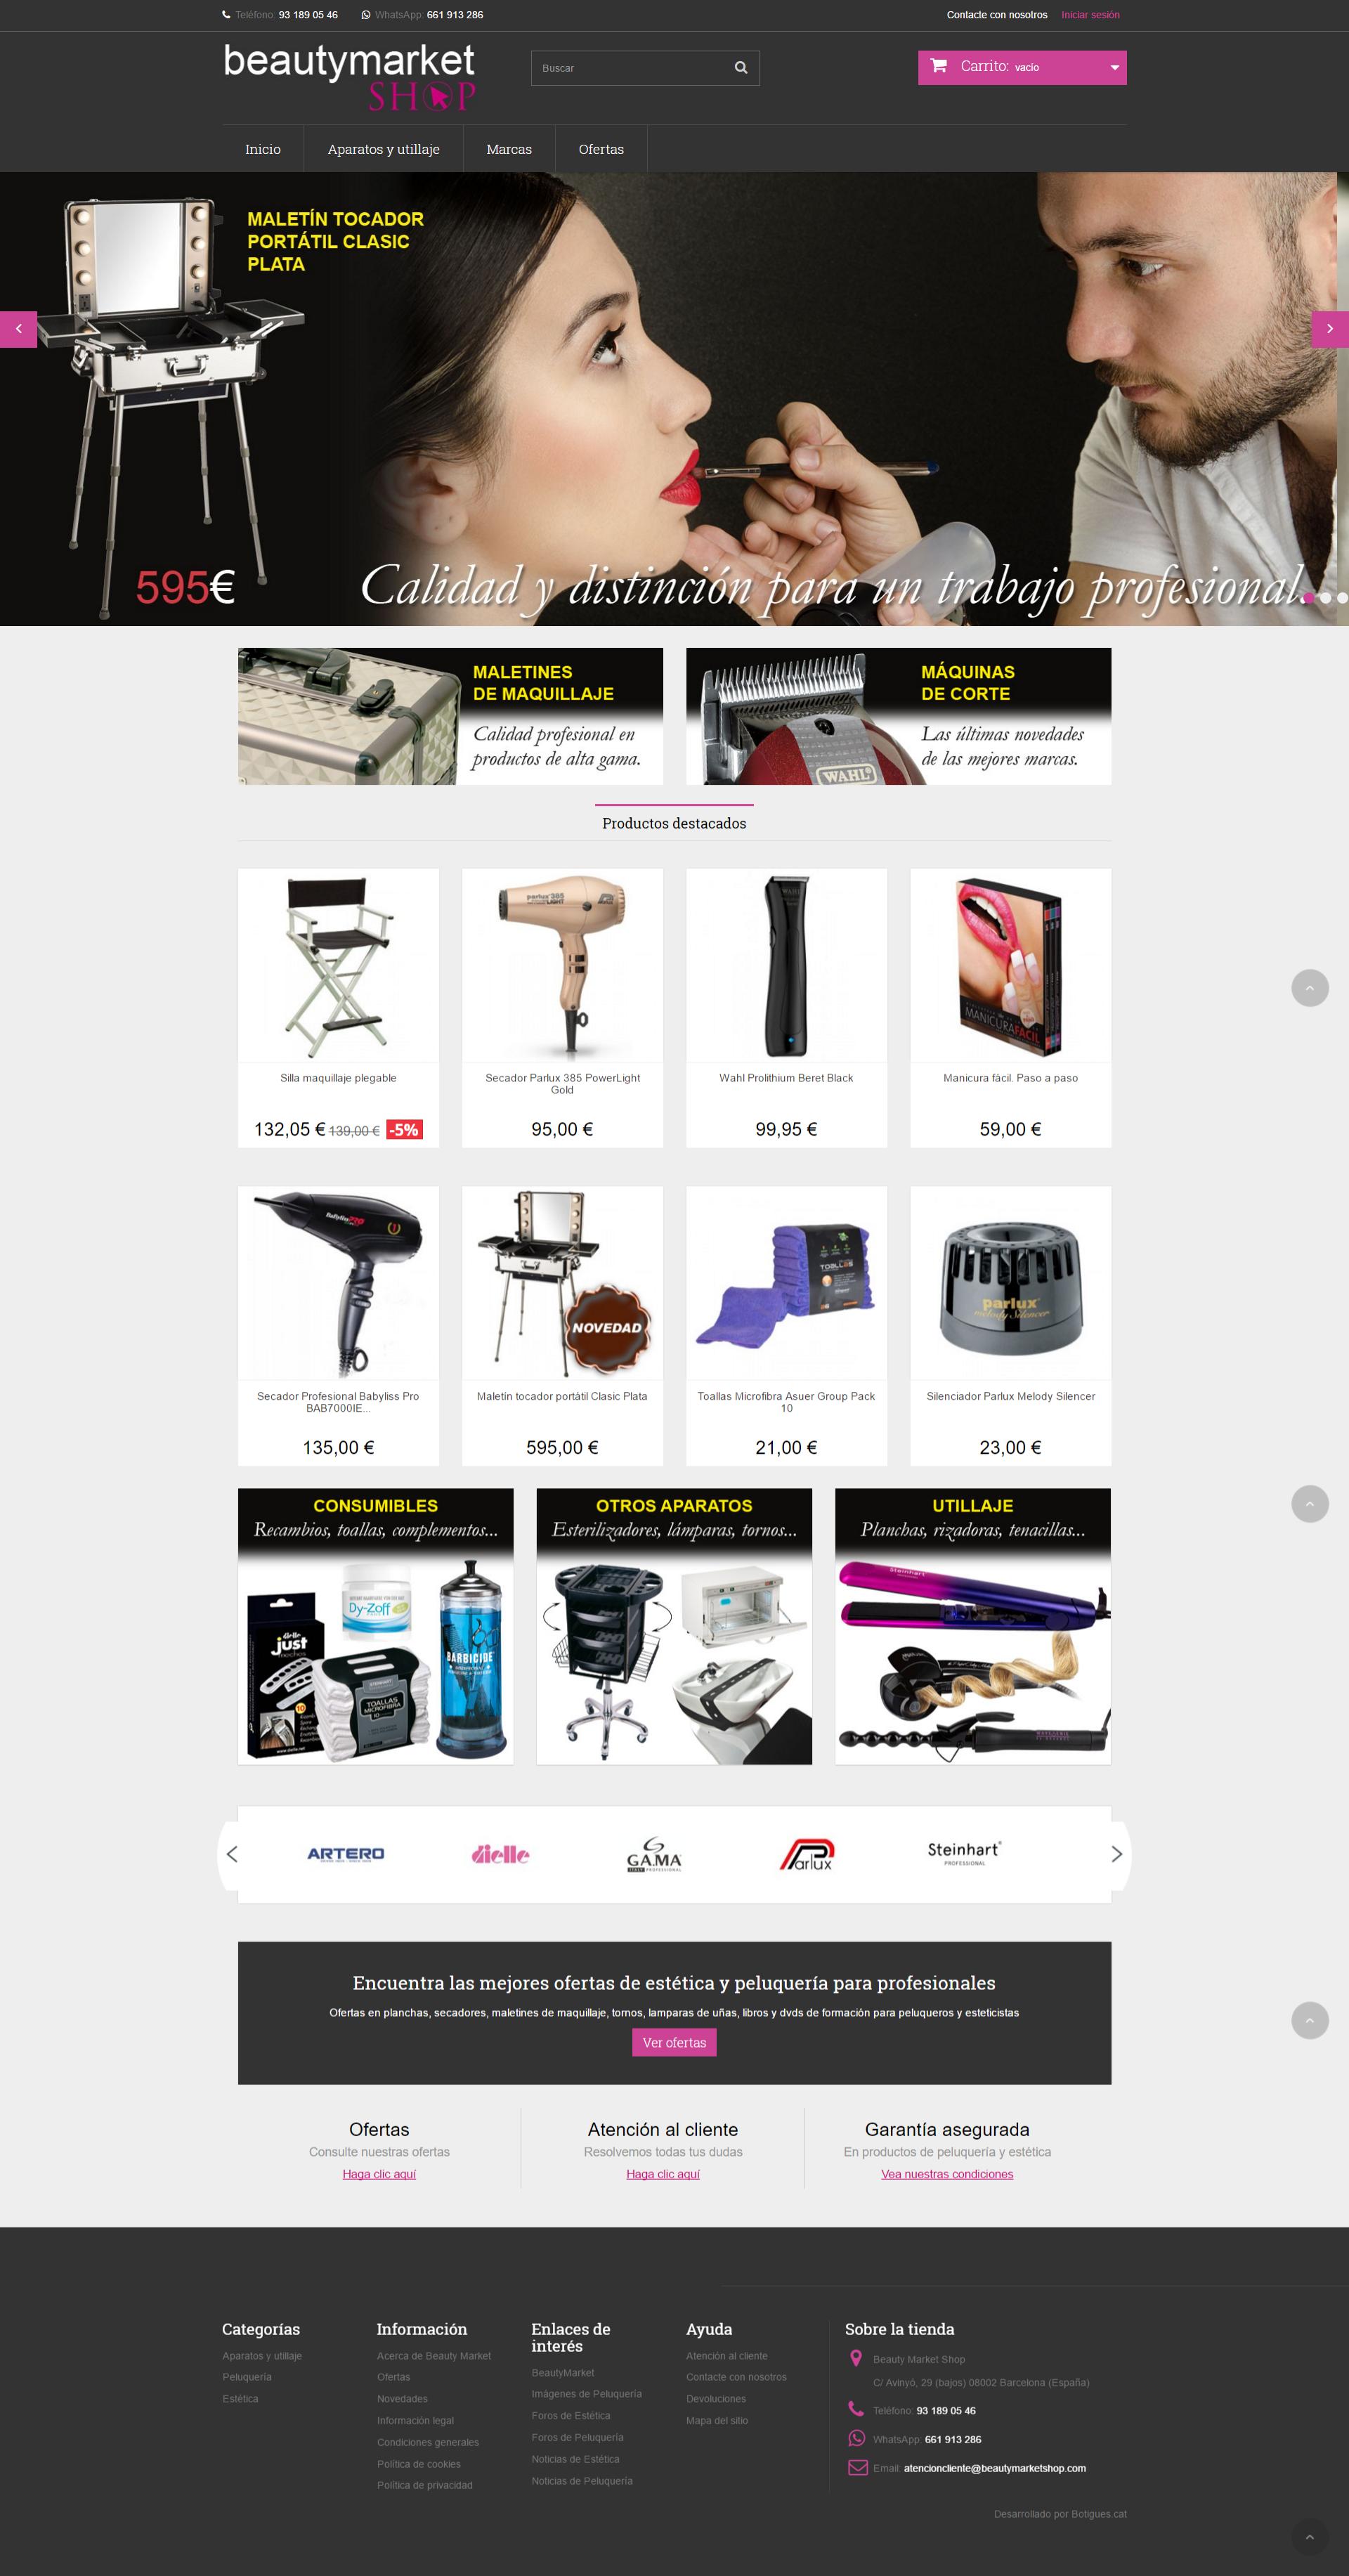 Botiga online Beautymarketshop